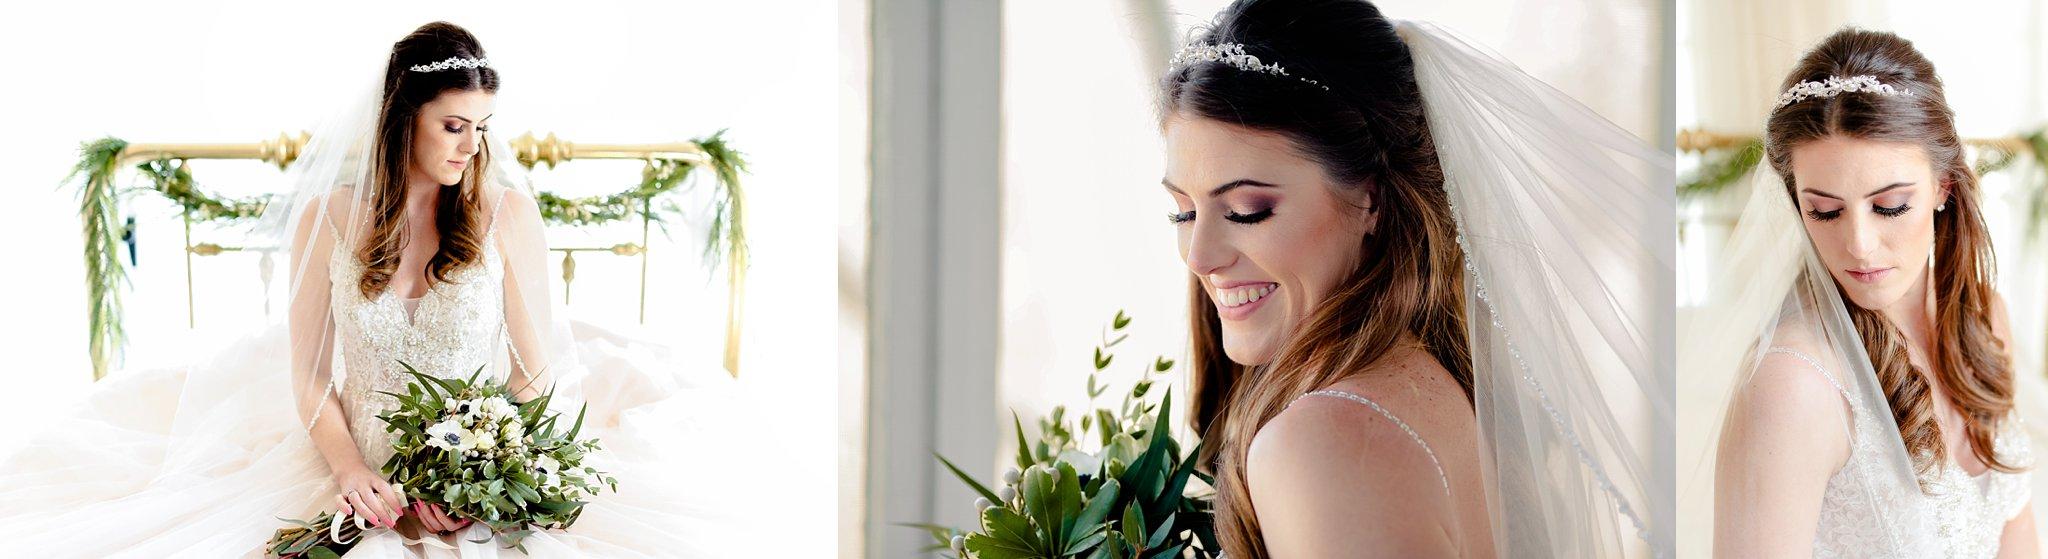 photographer_wedding_saint_louis_Kansas_City_Photography_Videography_workshop_training_styled_engagement_Lake_Ozark_KC_MO_STL_Rolla_Hermann_Saint_James_0450.jpg